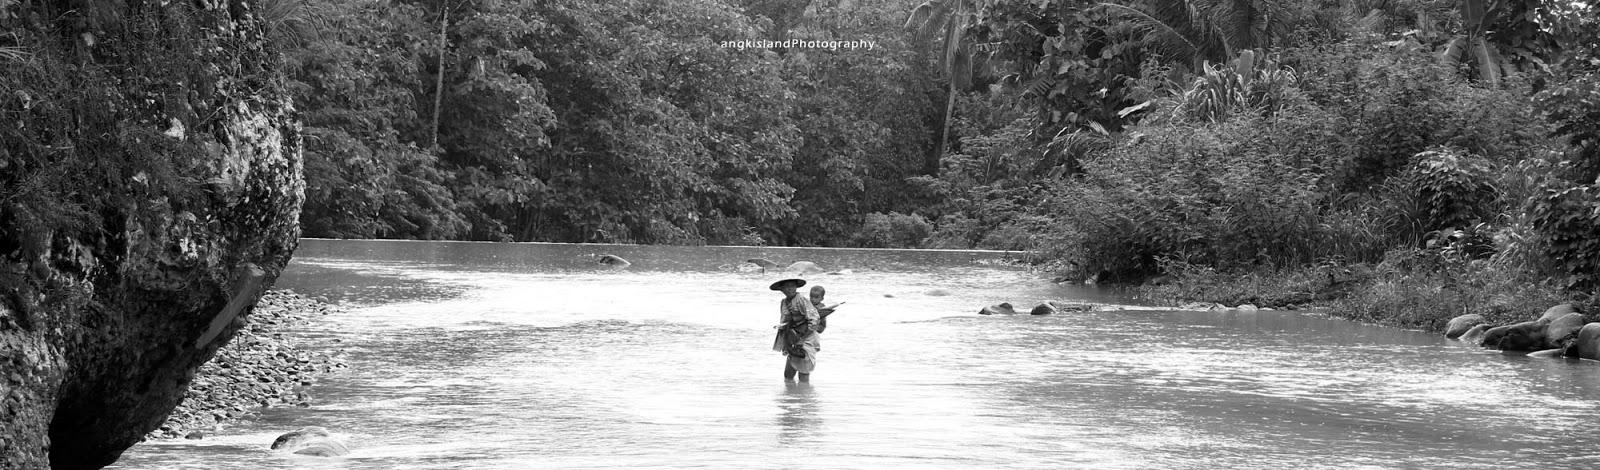 menyebrang sungai